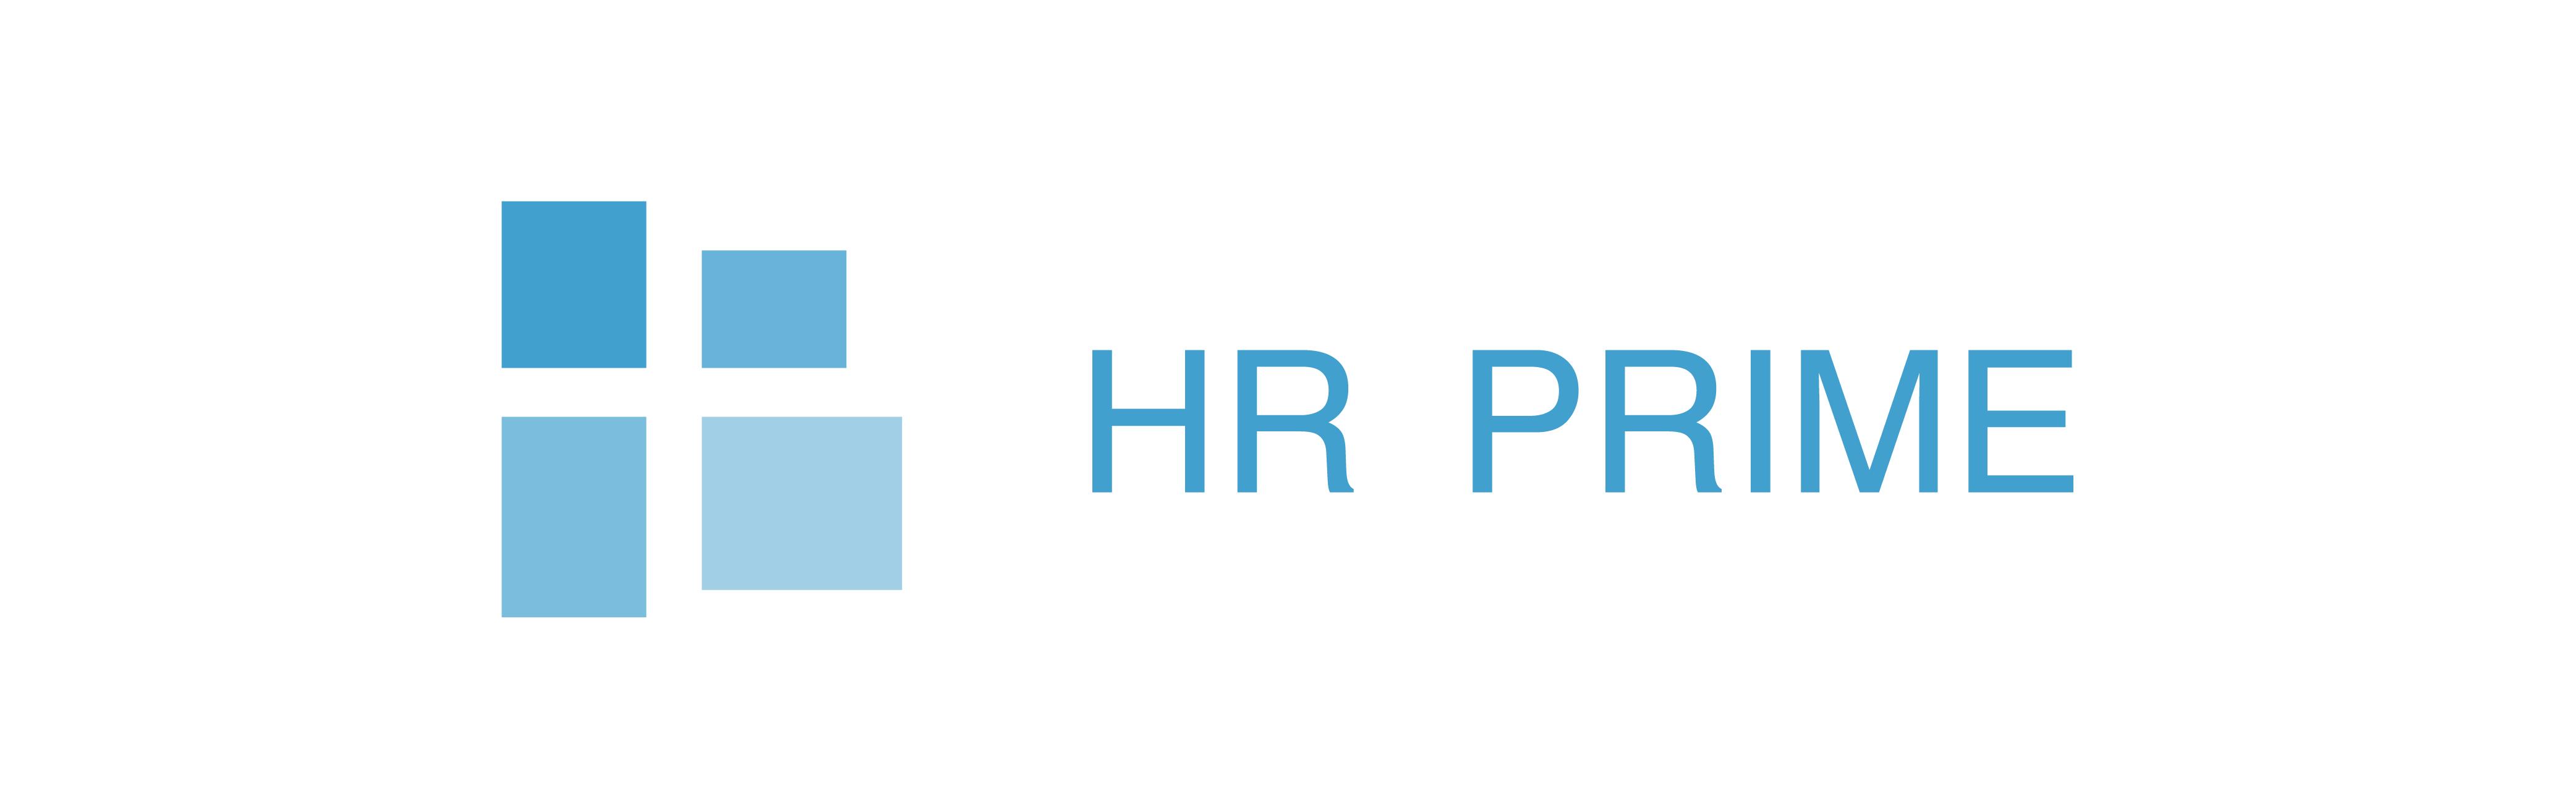 HR PRIME